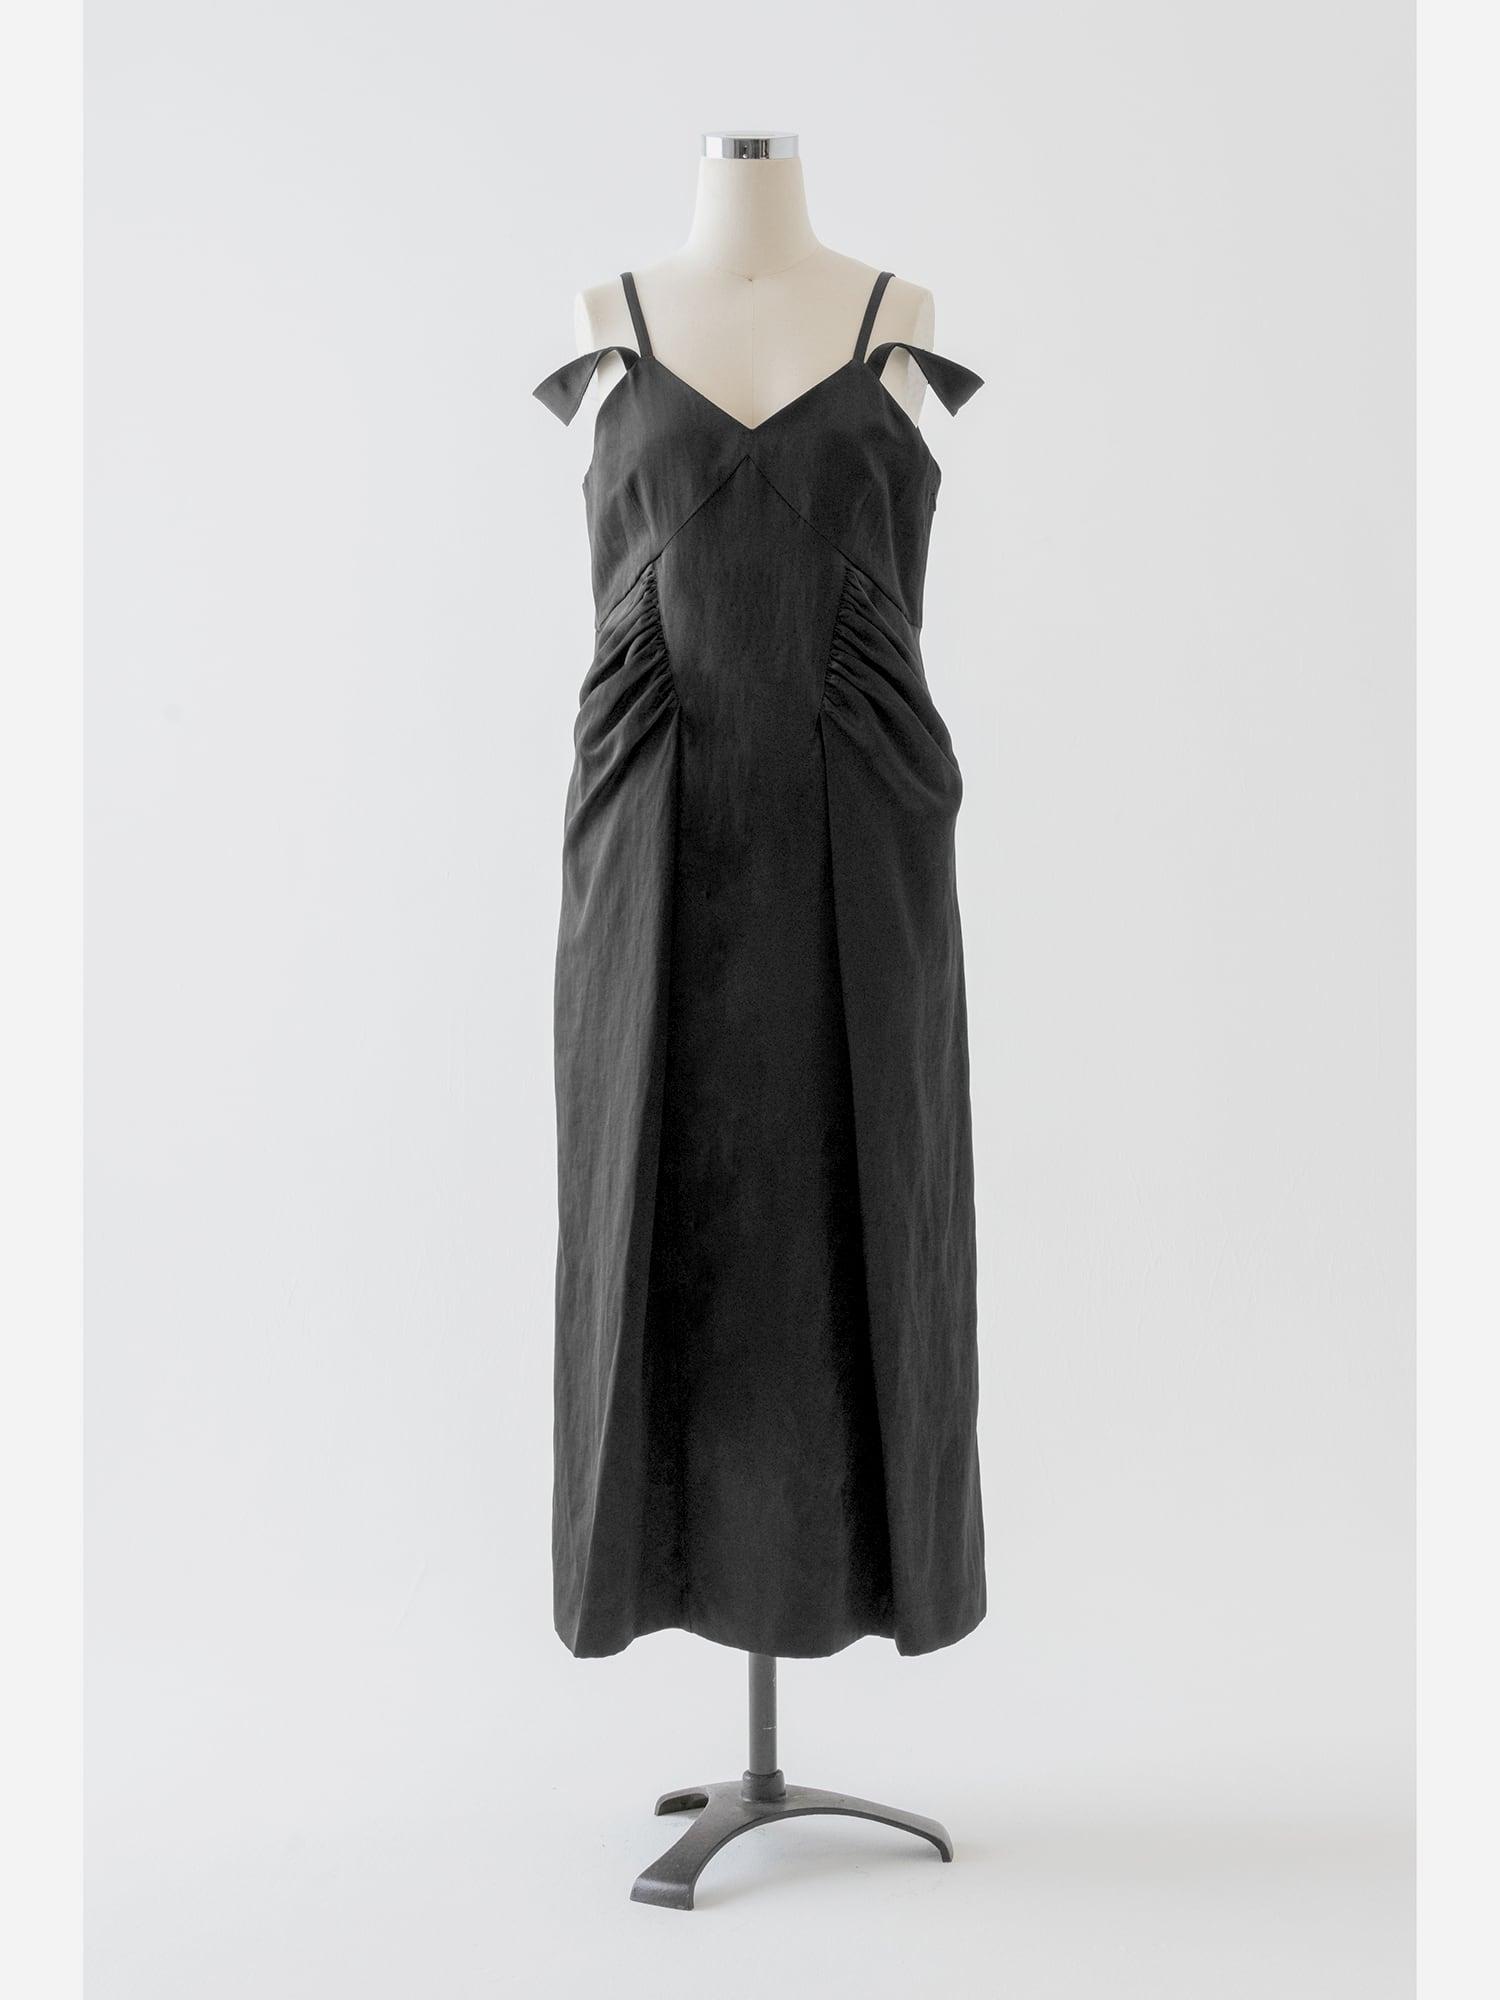 【予約】AKIKOAOKI slipping dress-02